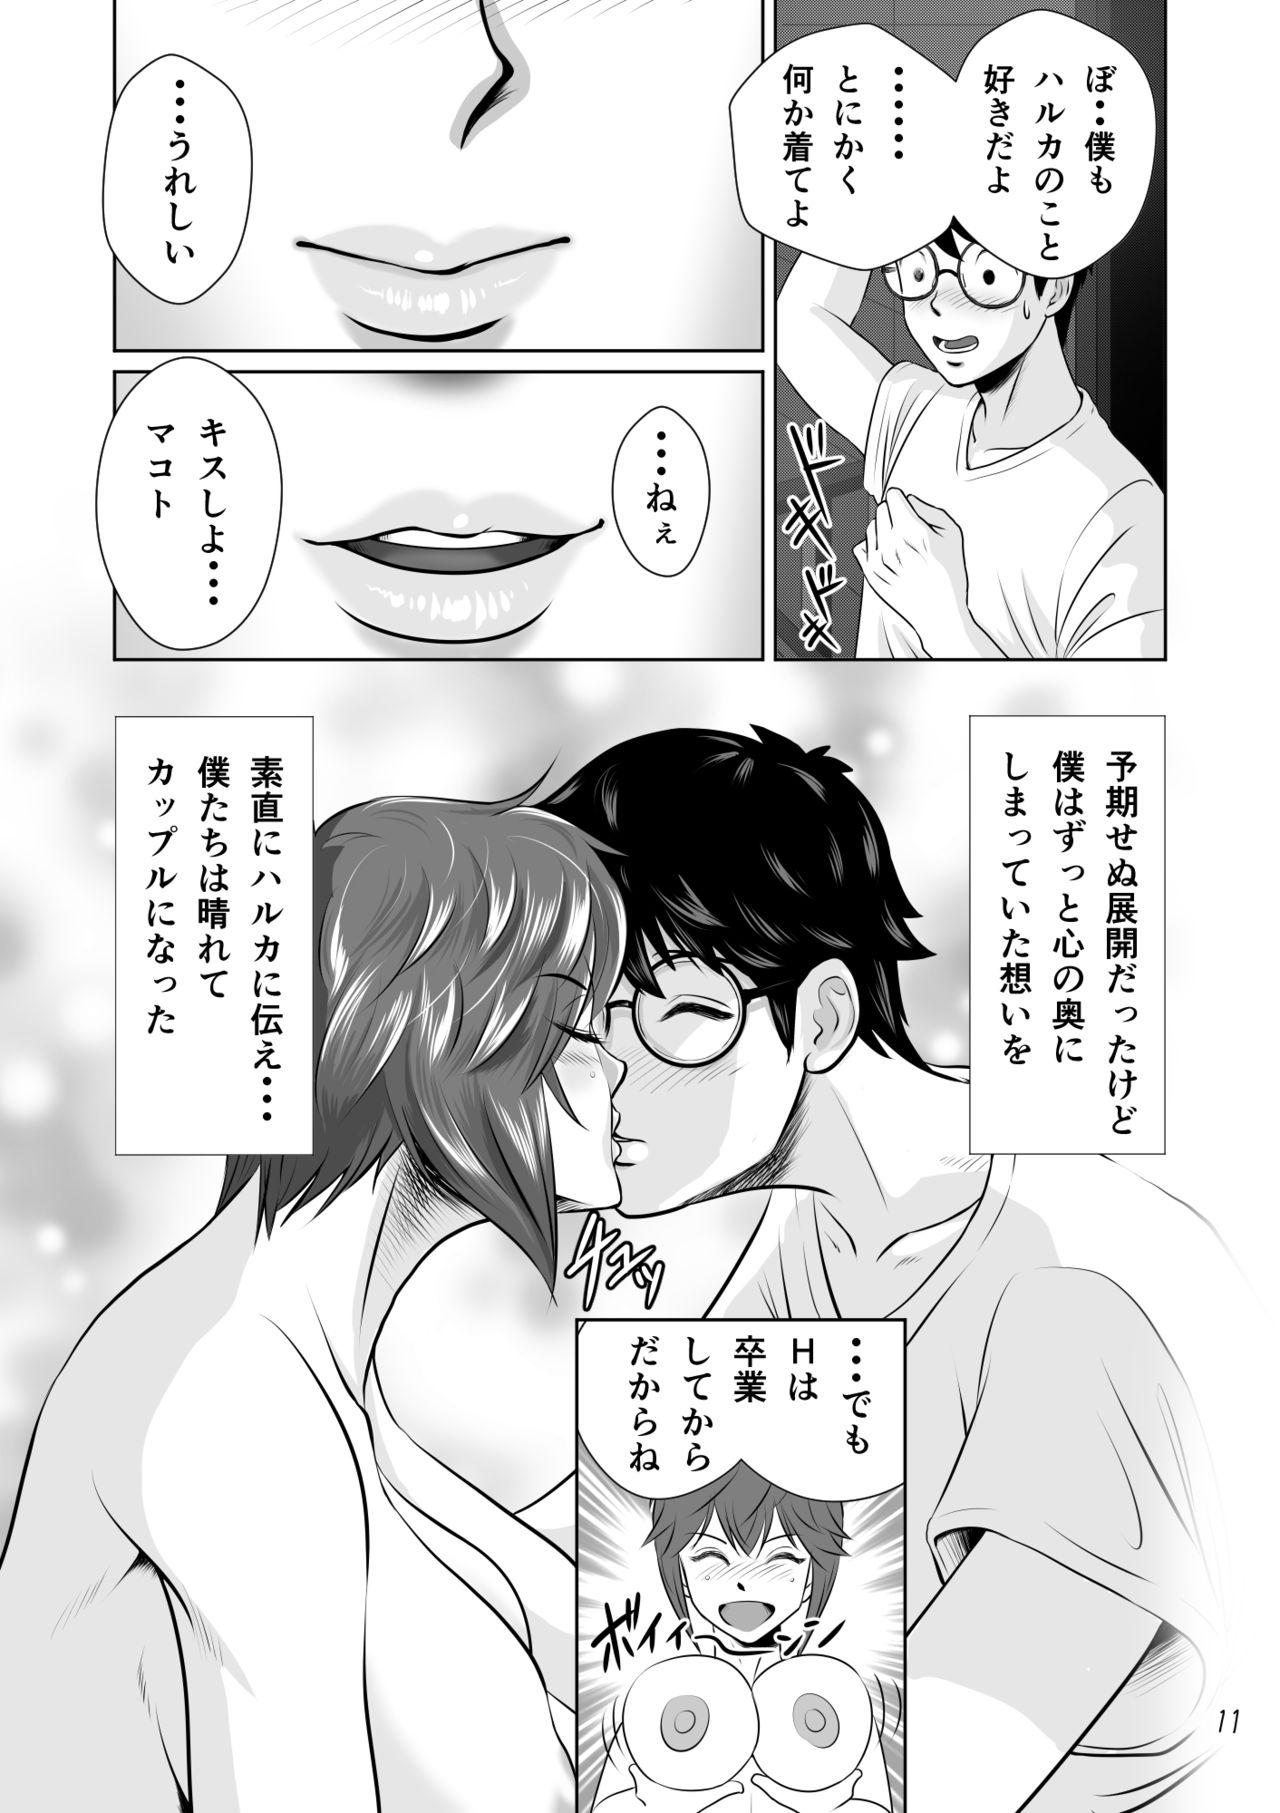 Netorare Osananajimi Haruka-chan Kiki Ippatsu!! 11